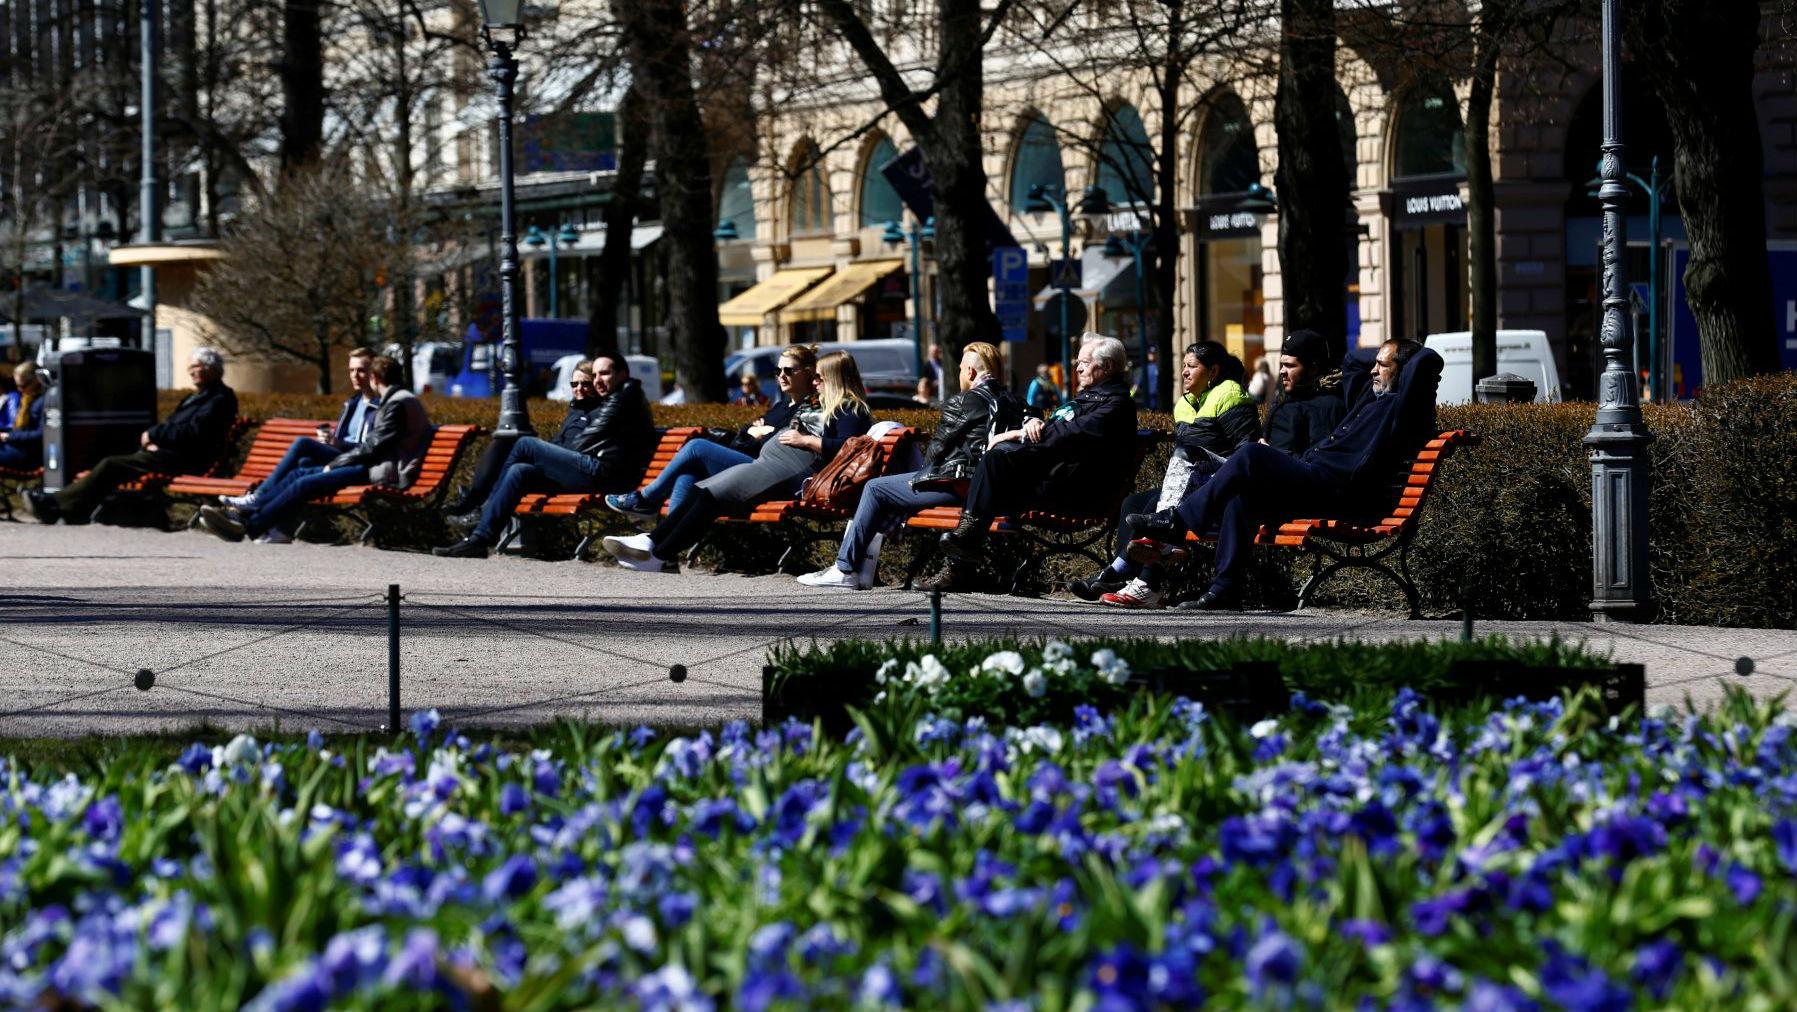 Warm, sunny weather eludes northern Finland